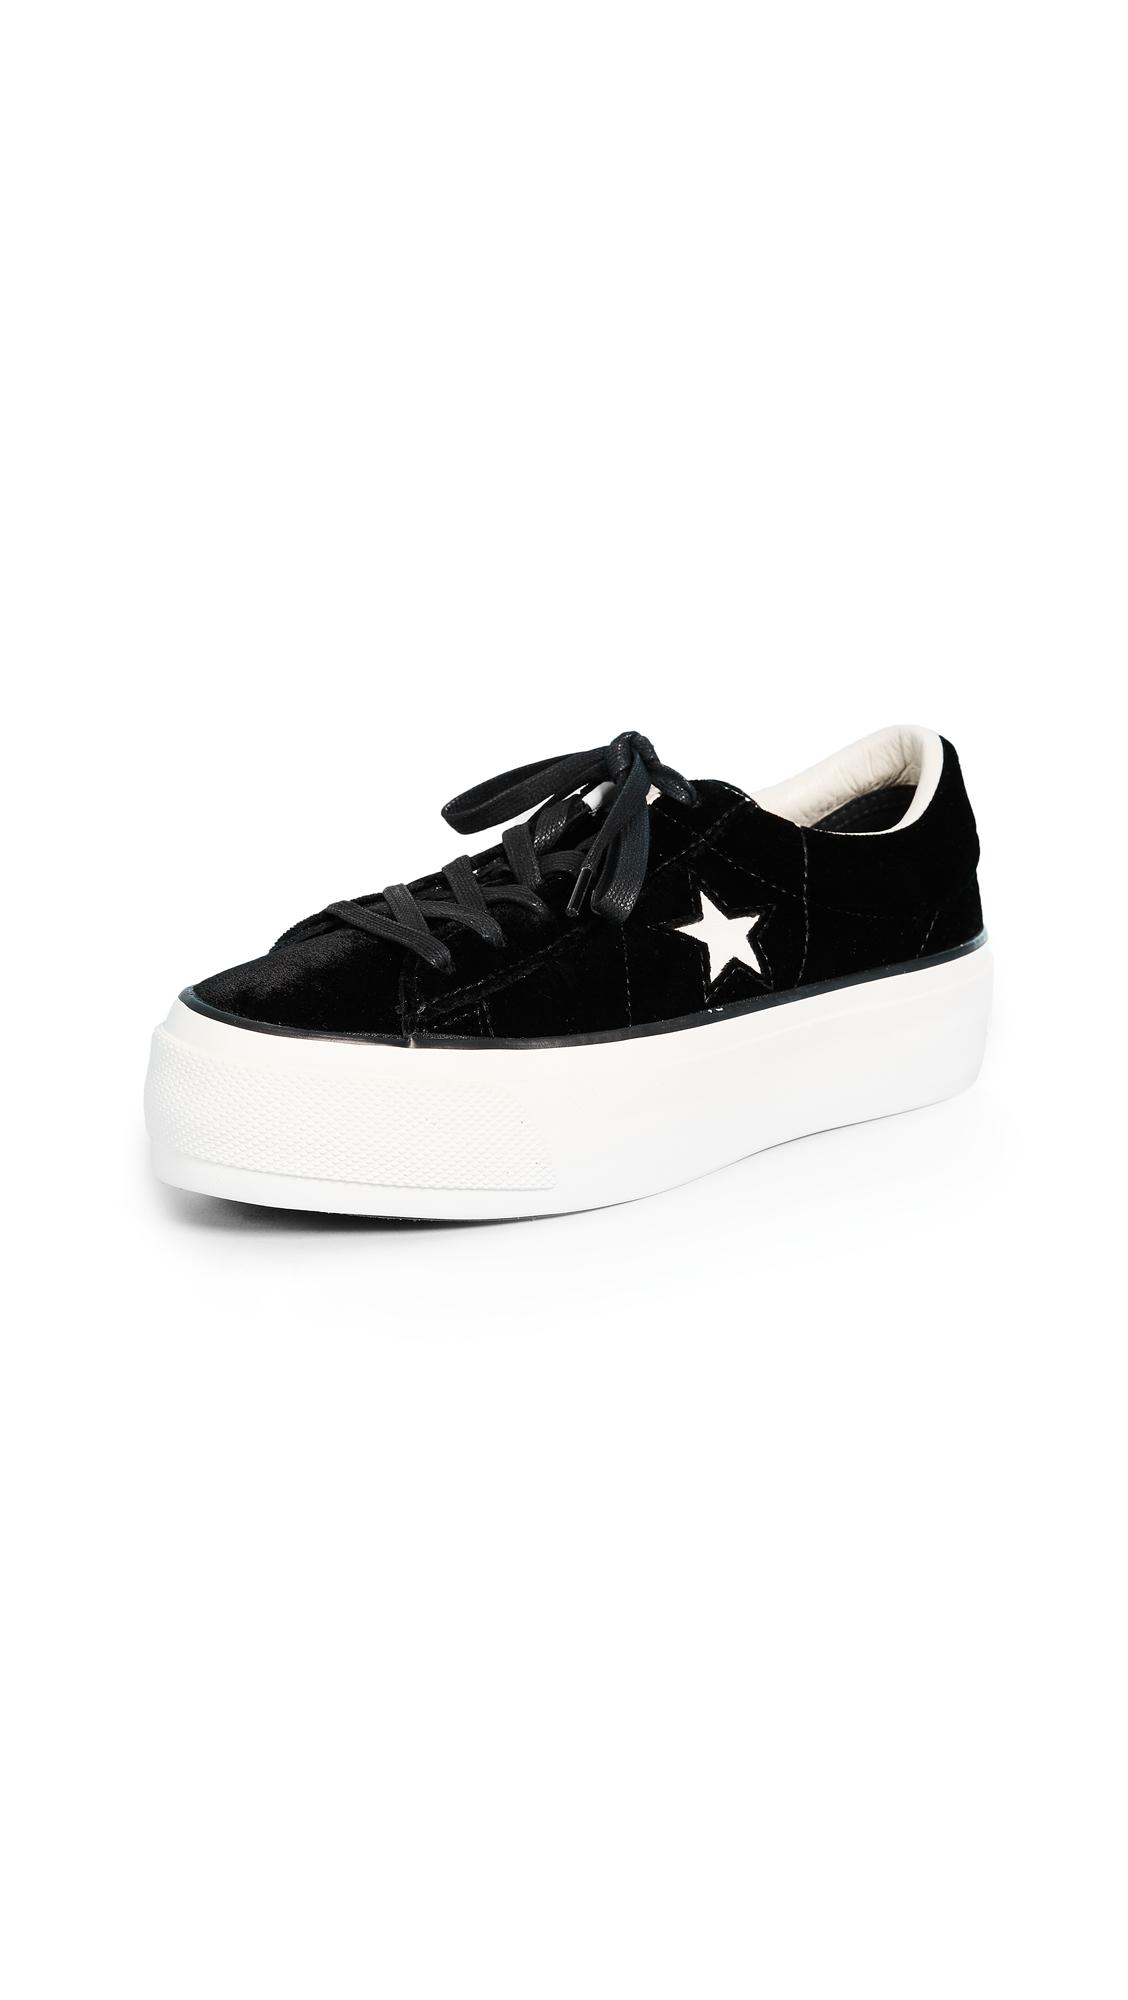 Converse One Star Platform Ox Sneakers - Black/Egret/Black